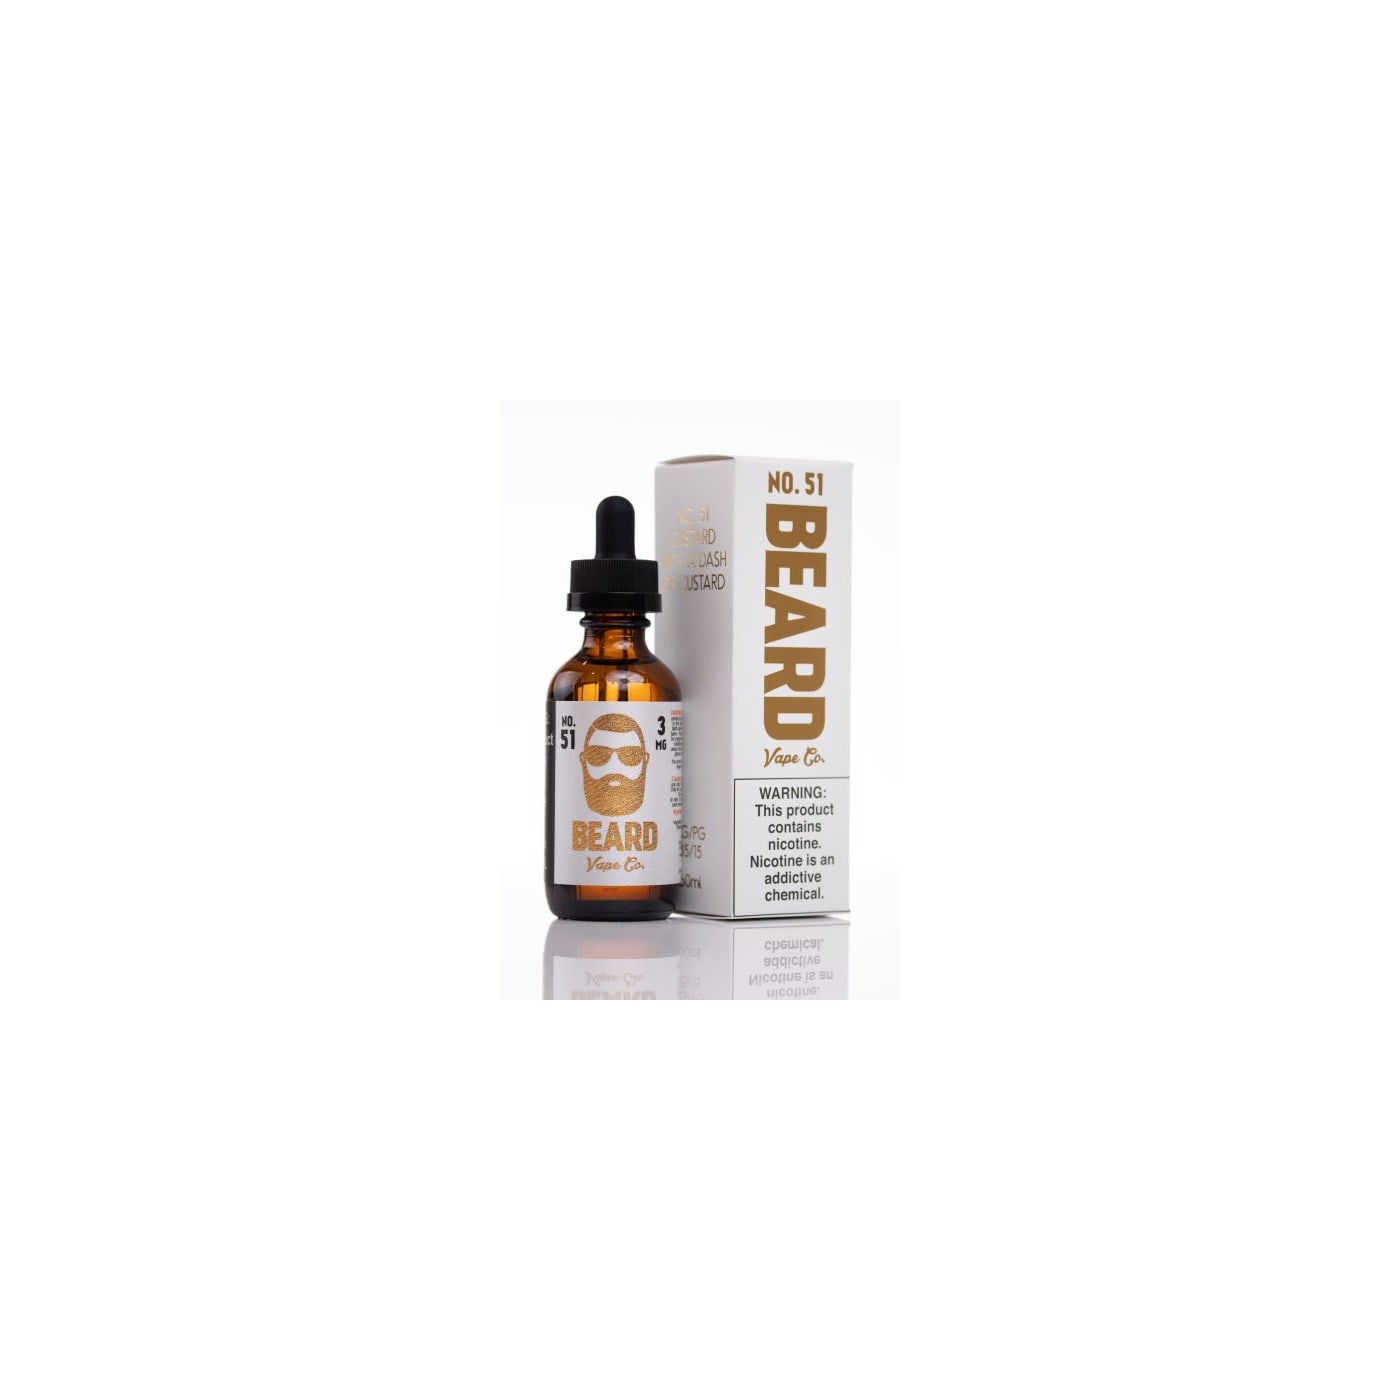 Beard Vape Co. No 51 Custard E-liquid 60ml